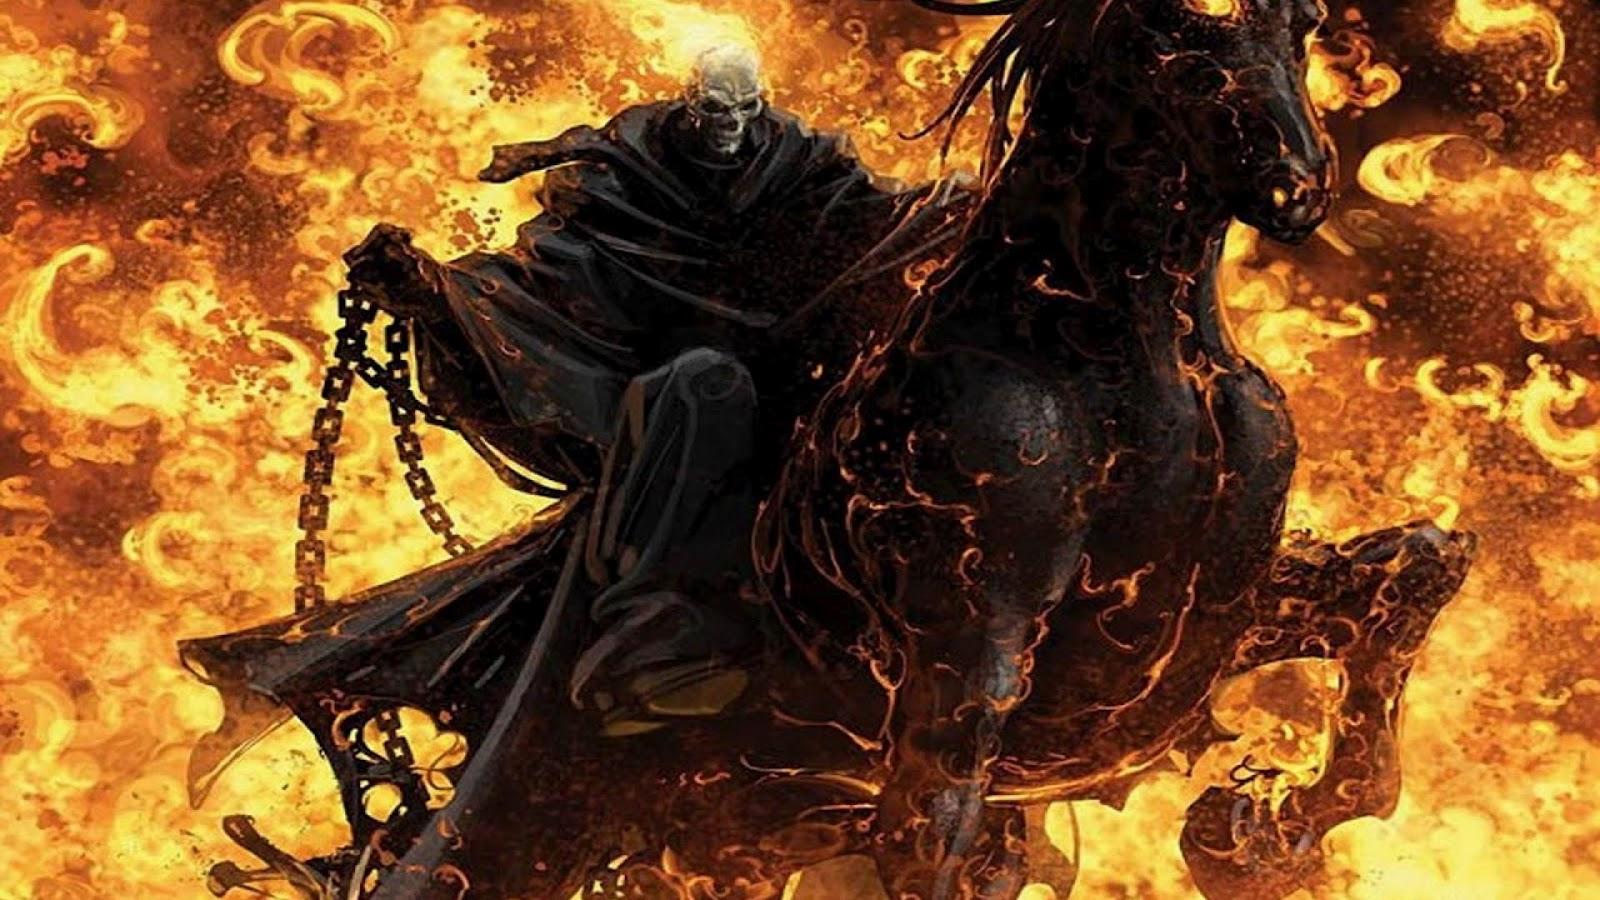 http://2.bp.blogspot.com/-6TSQNorfJow/UBCufYlK-SI/AAAAAAAAB8c/CXpkndlYIDs/s1600/ghost-rider-spirit-of-vengeance-1080x1920+1.jpg